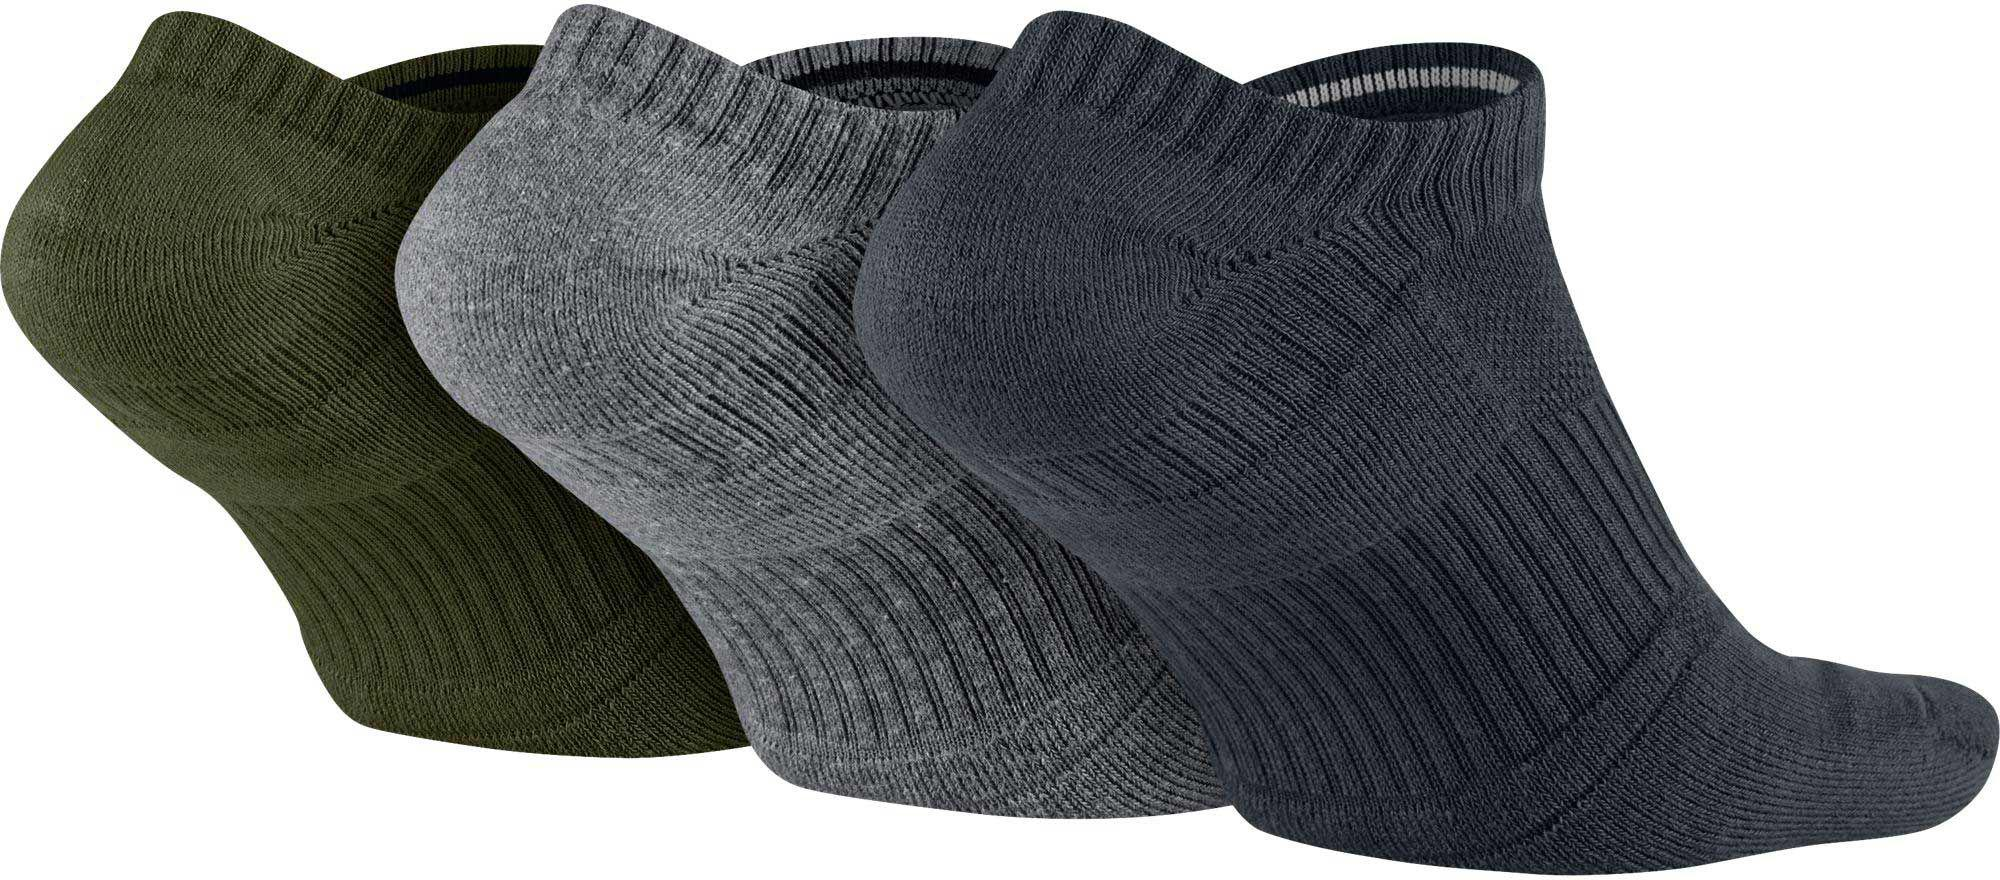 8eb0d22794d Lyst - Nike Dri-fit Half Cushion No Show Socks 3 Pack in Gray for Men